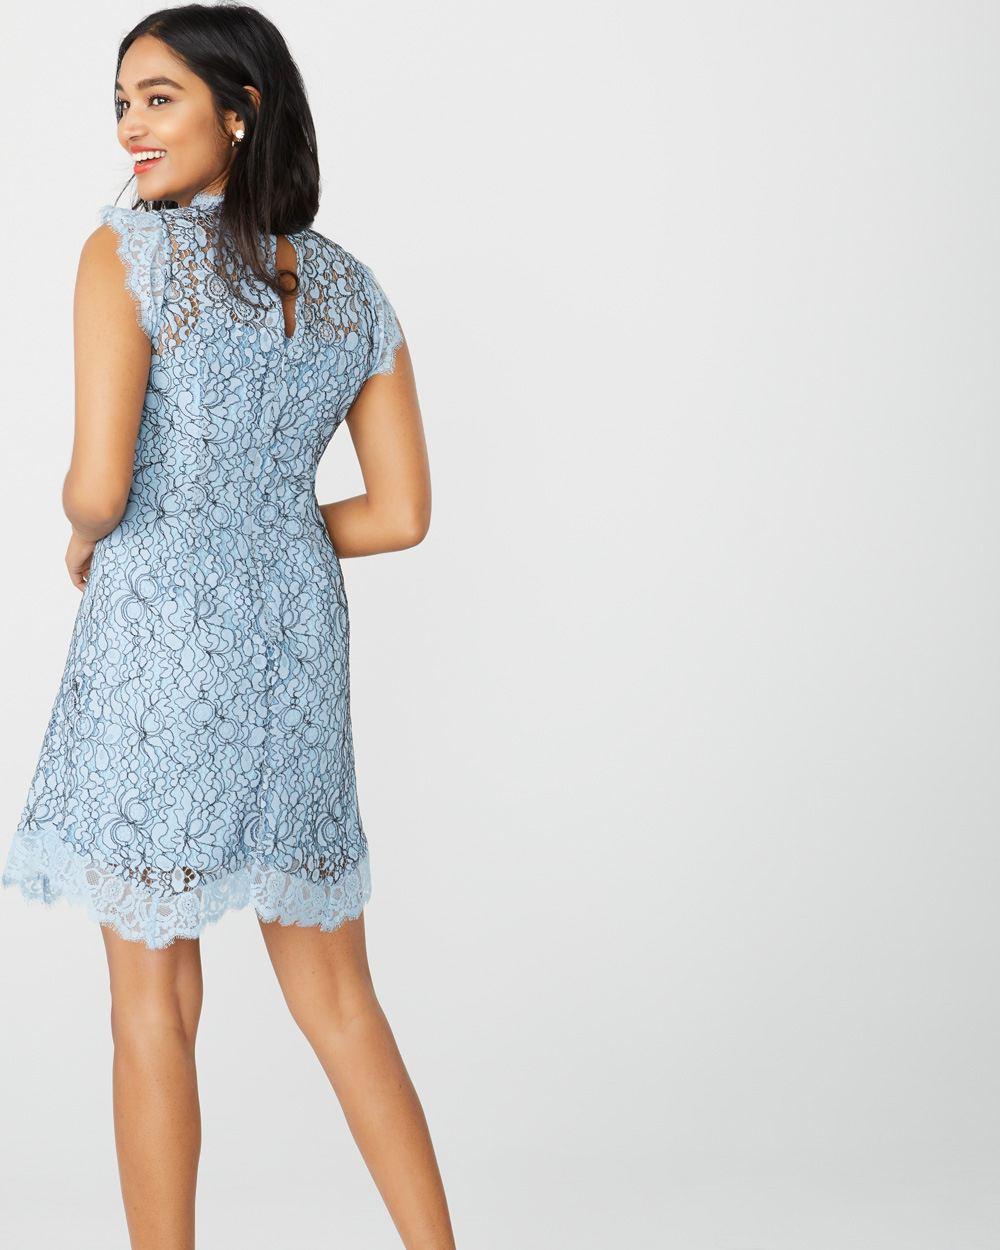 Magasin robe de cocktail 77